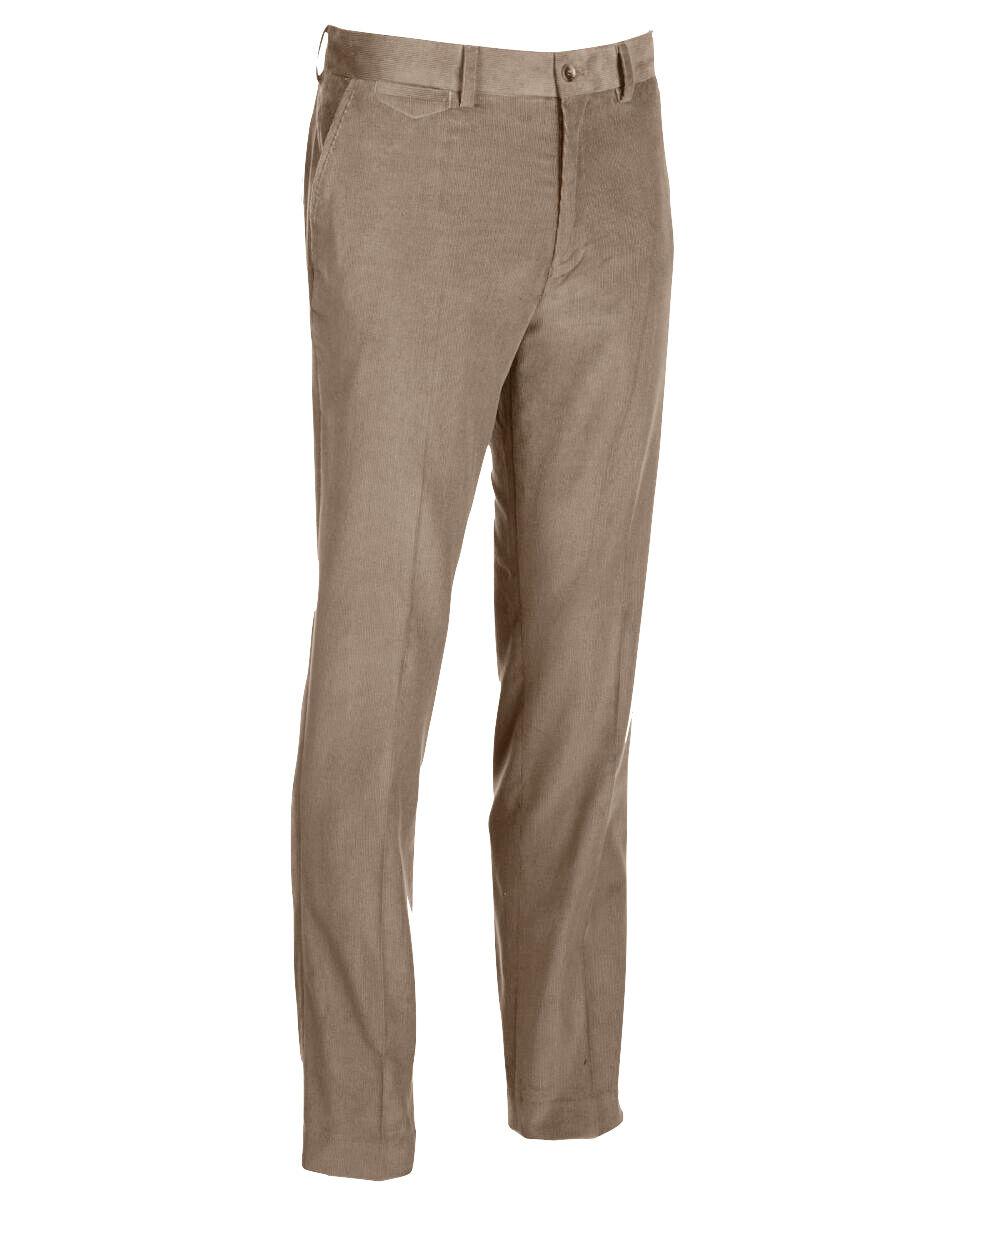 Tailorbyrd - Mens 36 34 -  Khaki Flat Front Straight Leg Micro-Corduroy Pants